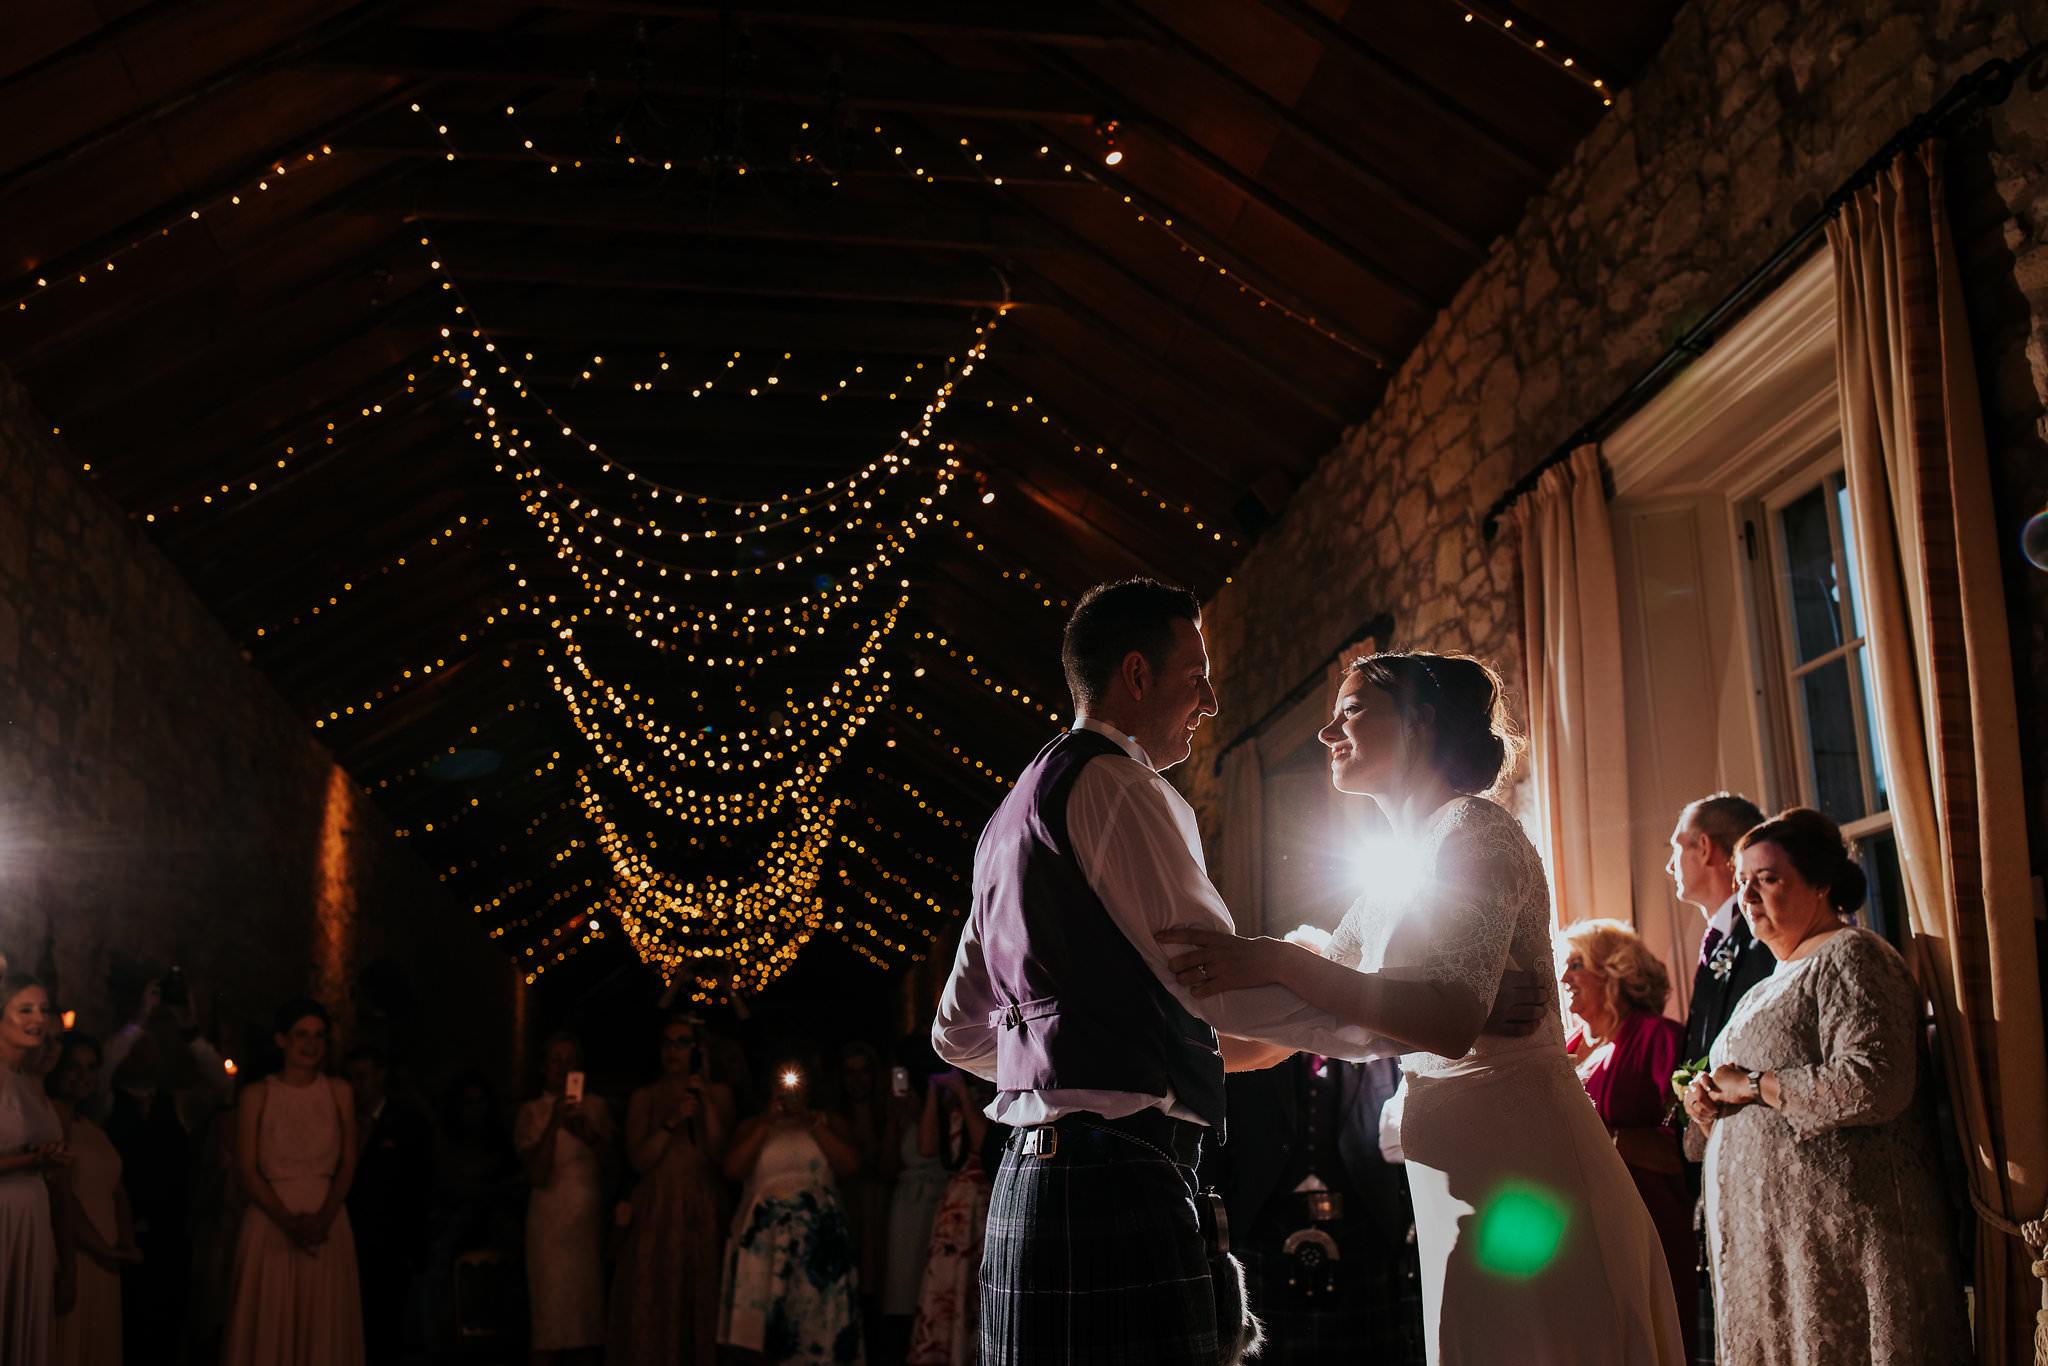 kirknewton stables wedding photographer (79).jpg